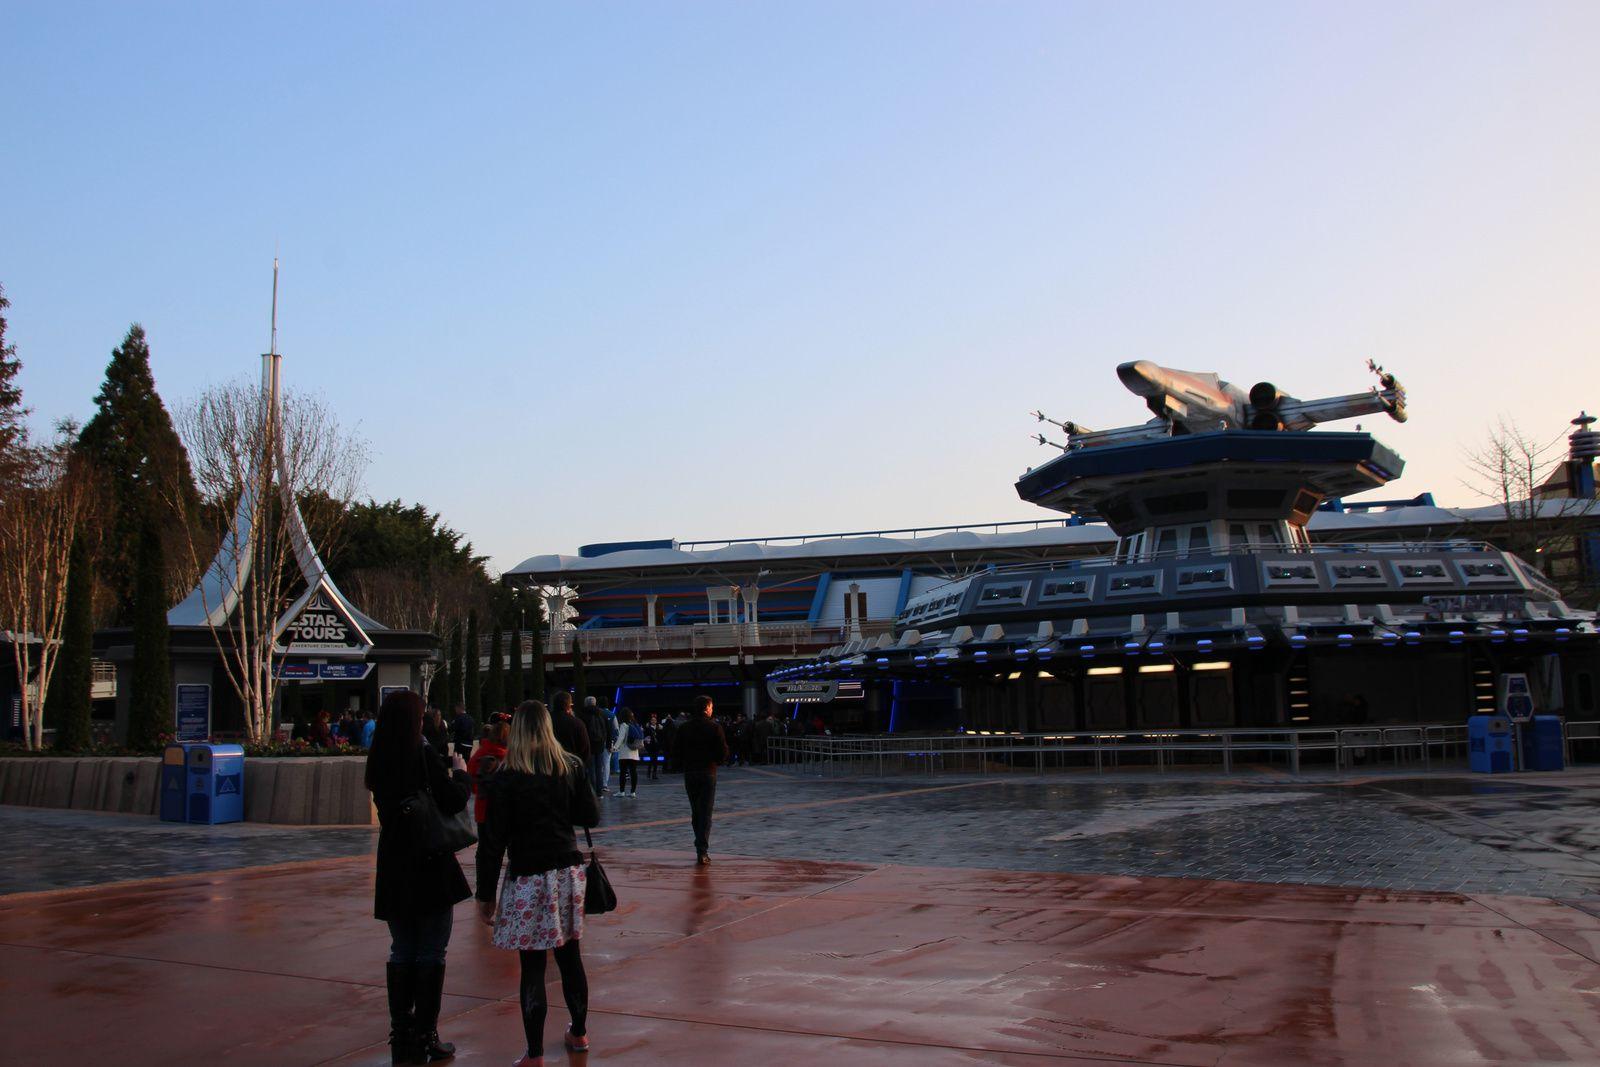 L'univers Star Wars à Disneyland Paris